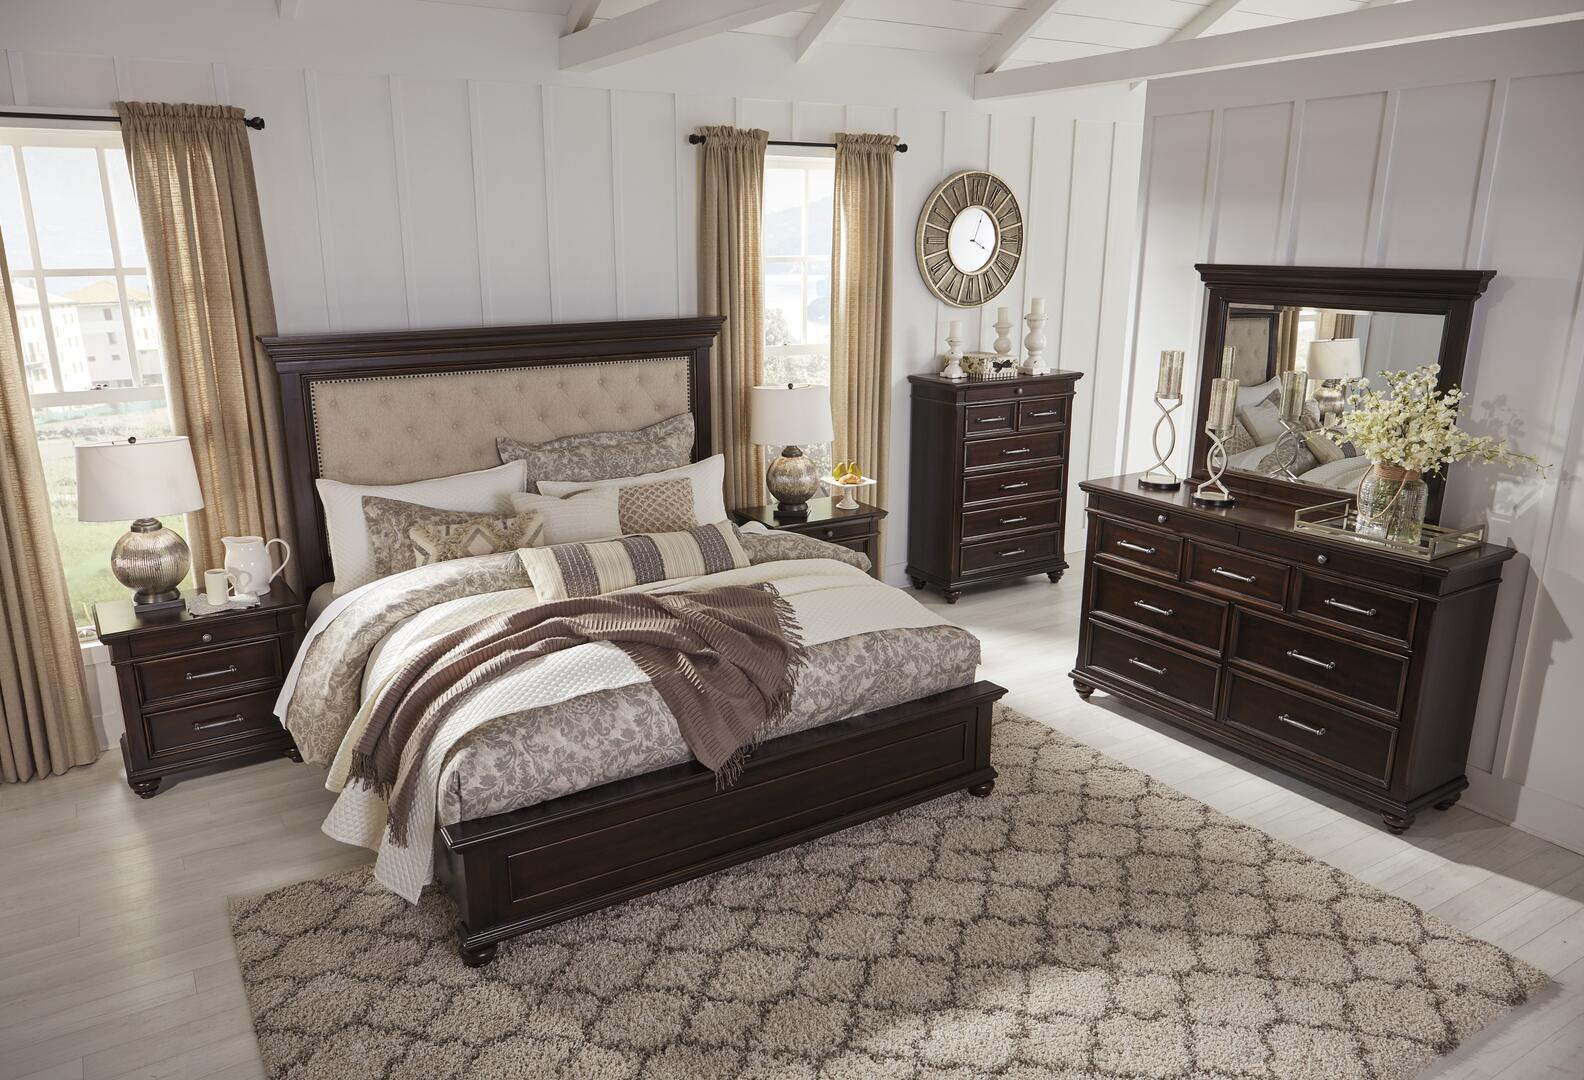 Signature Design by Ashley Brynhurst 6 Piece King Size Bedroom Set